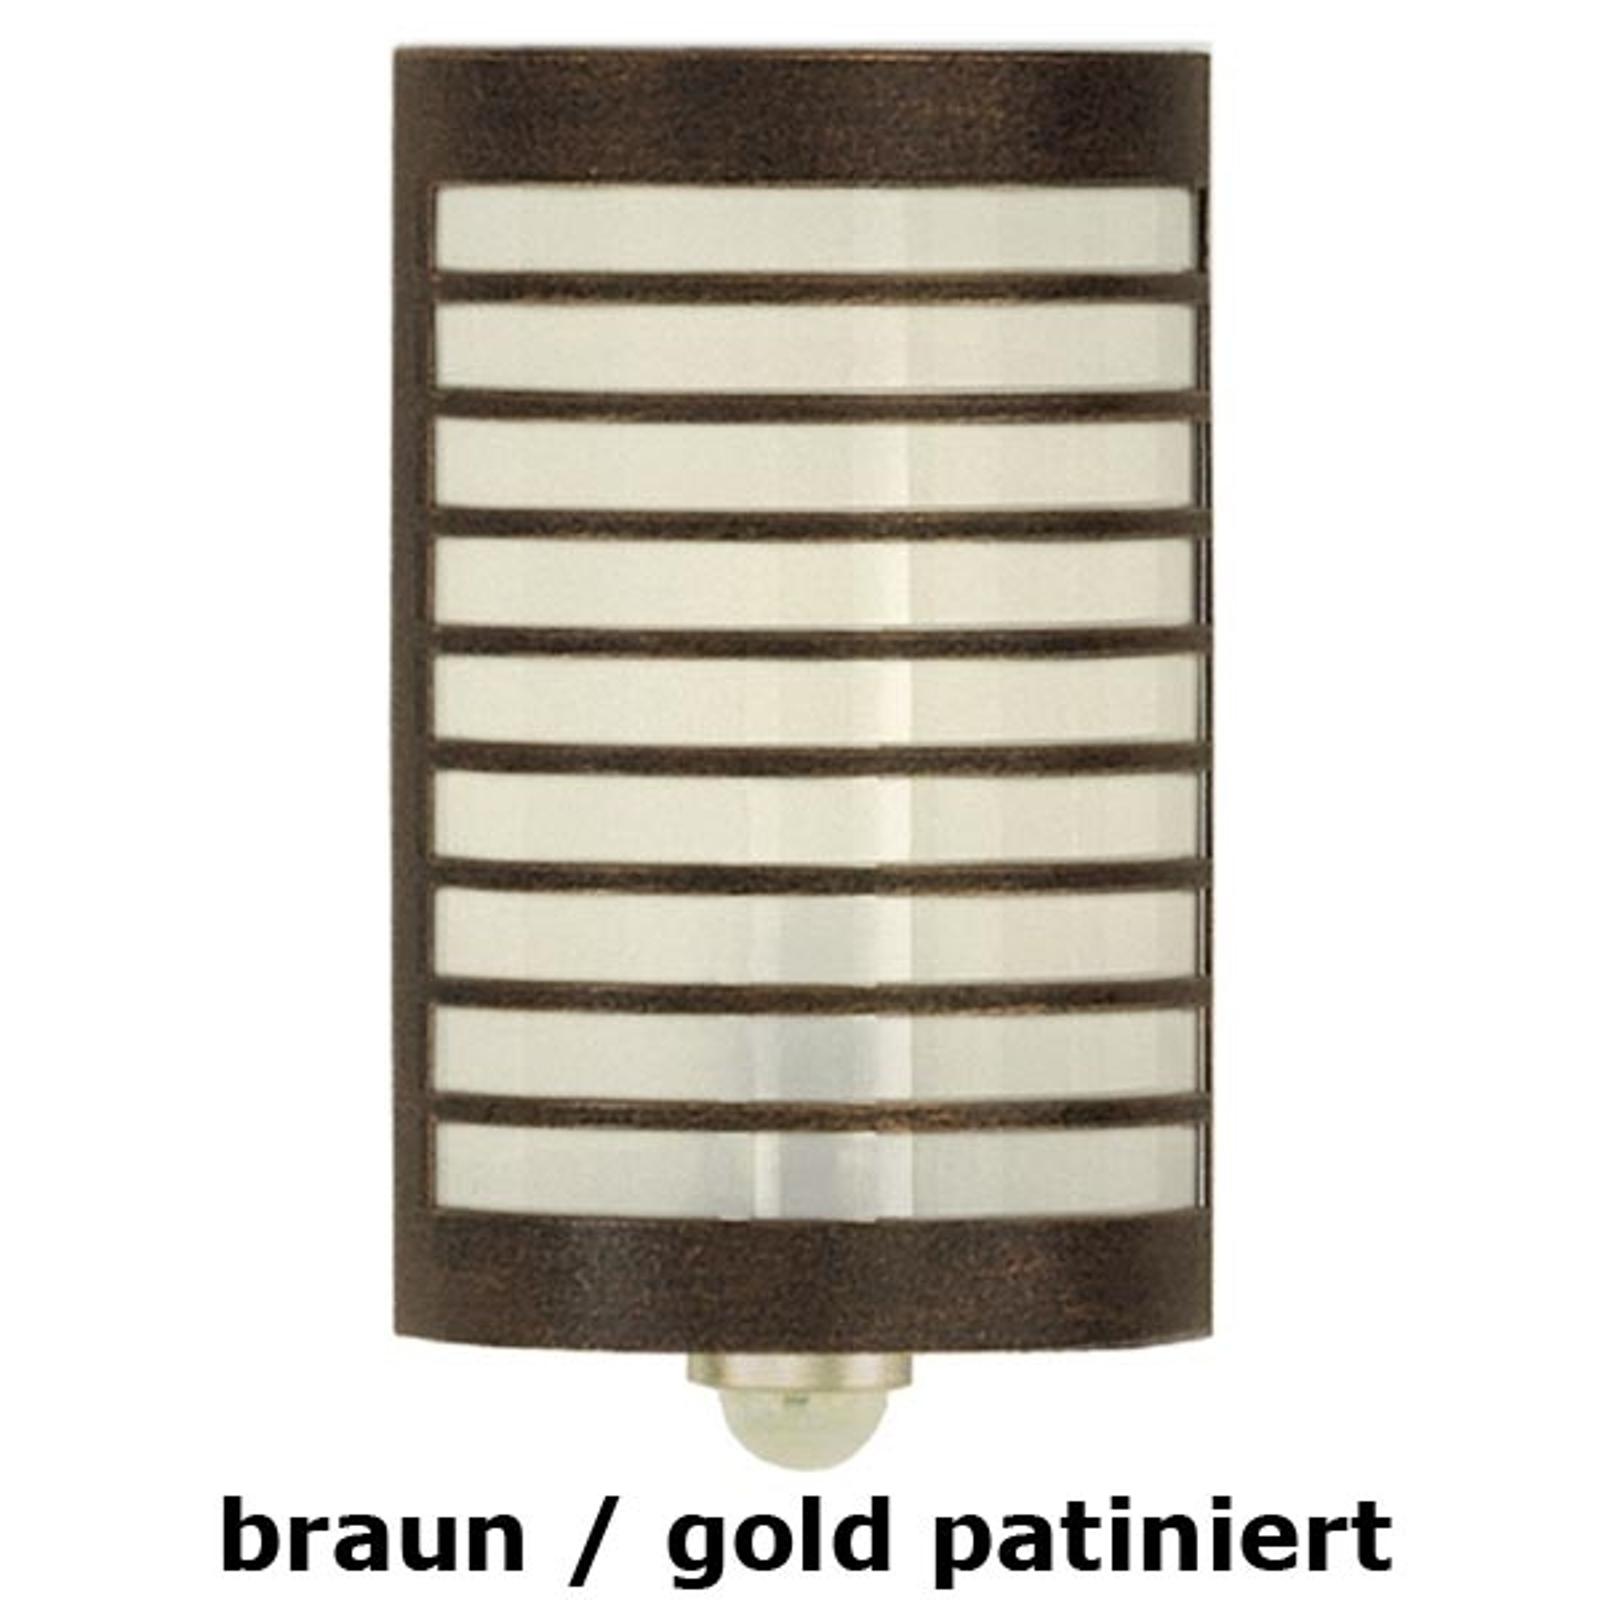 Wandlamp TERU met bewegingss. bruin-goud gepat.